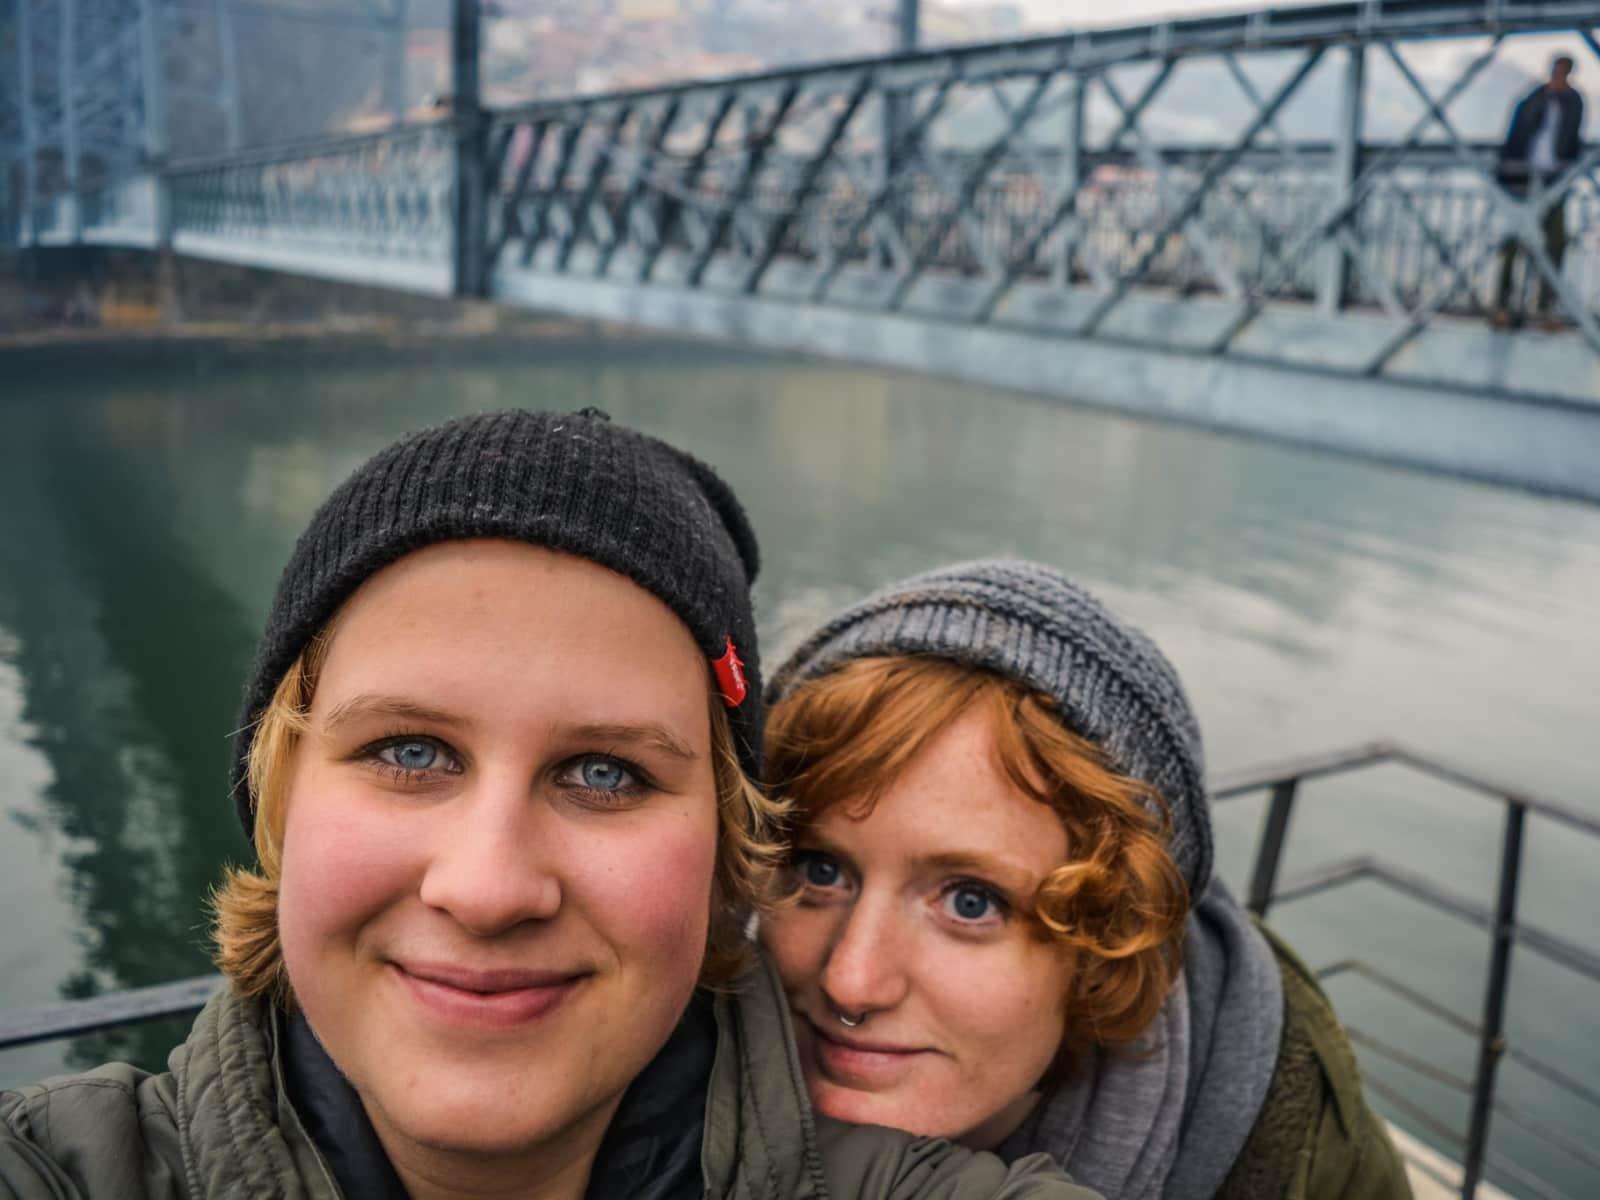 Michele & Sanne lillian from Butgenbach, Belgium